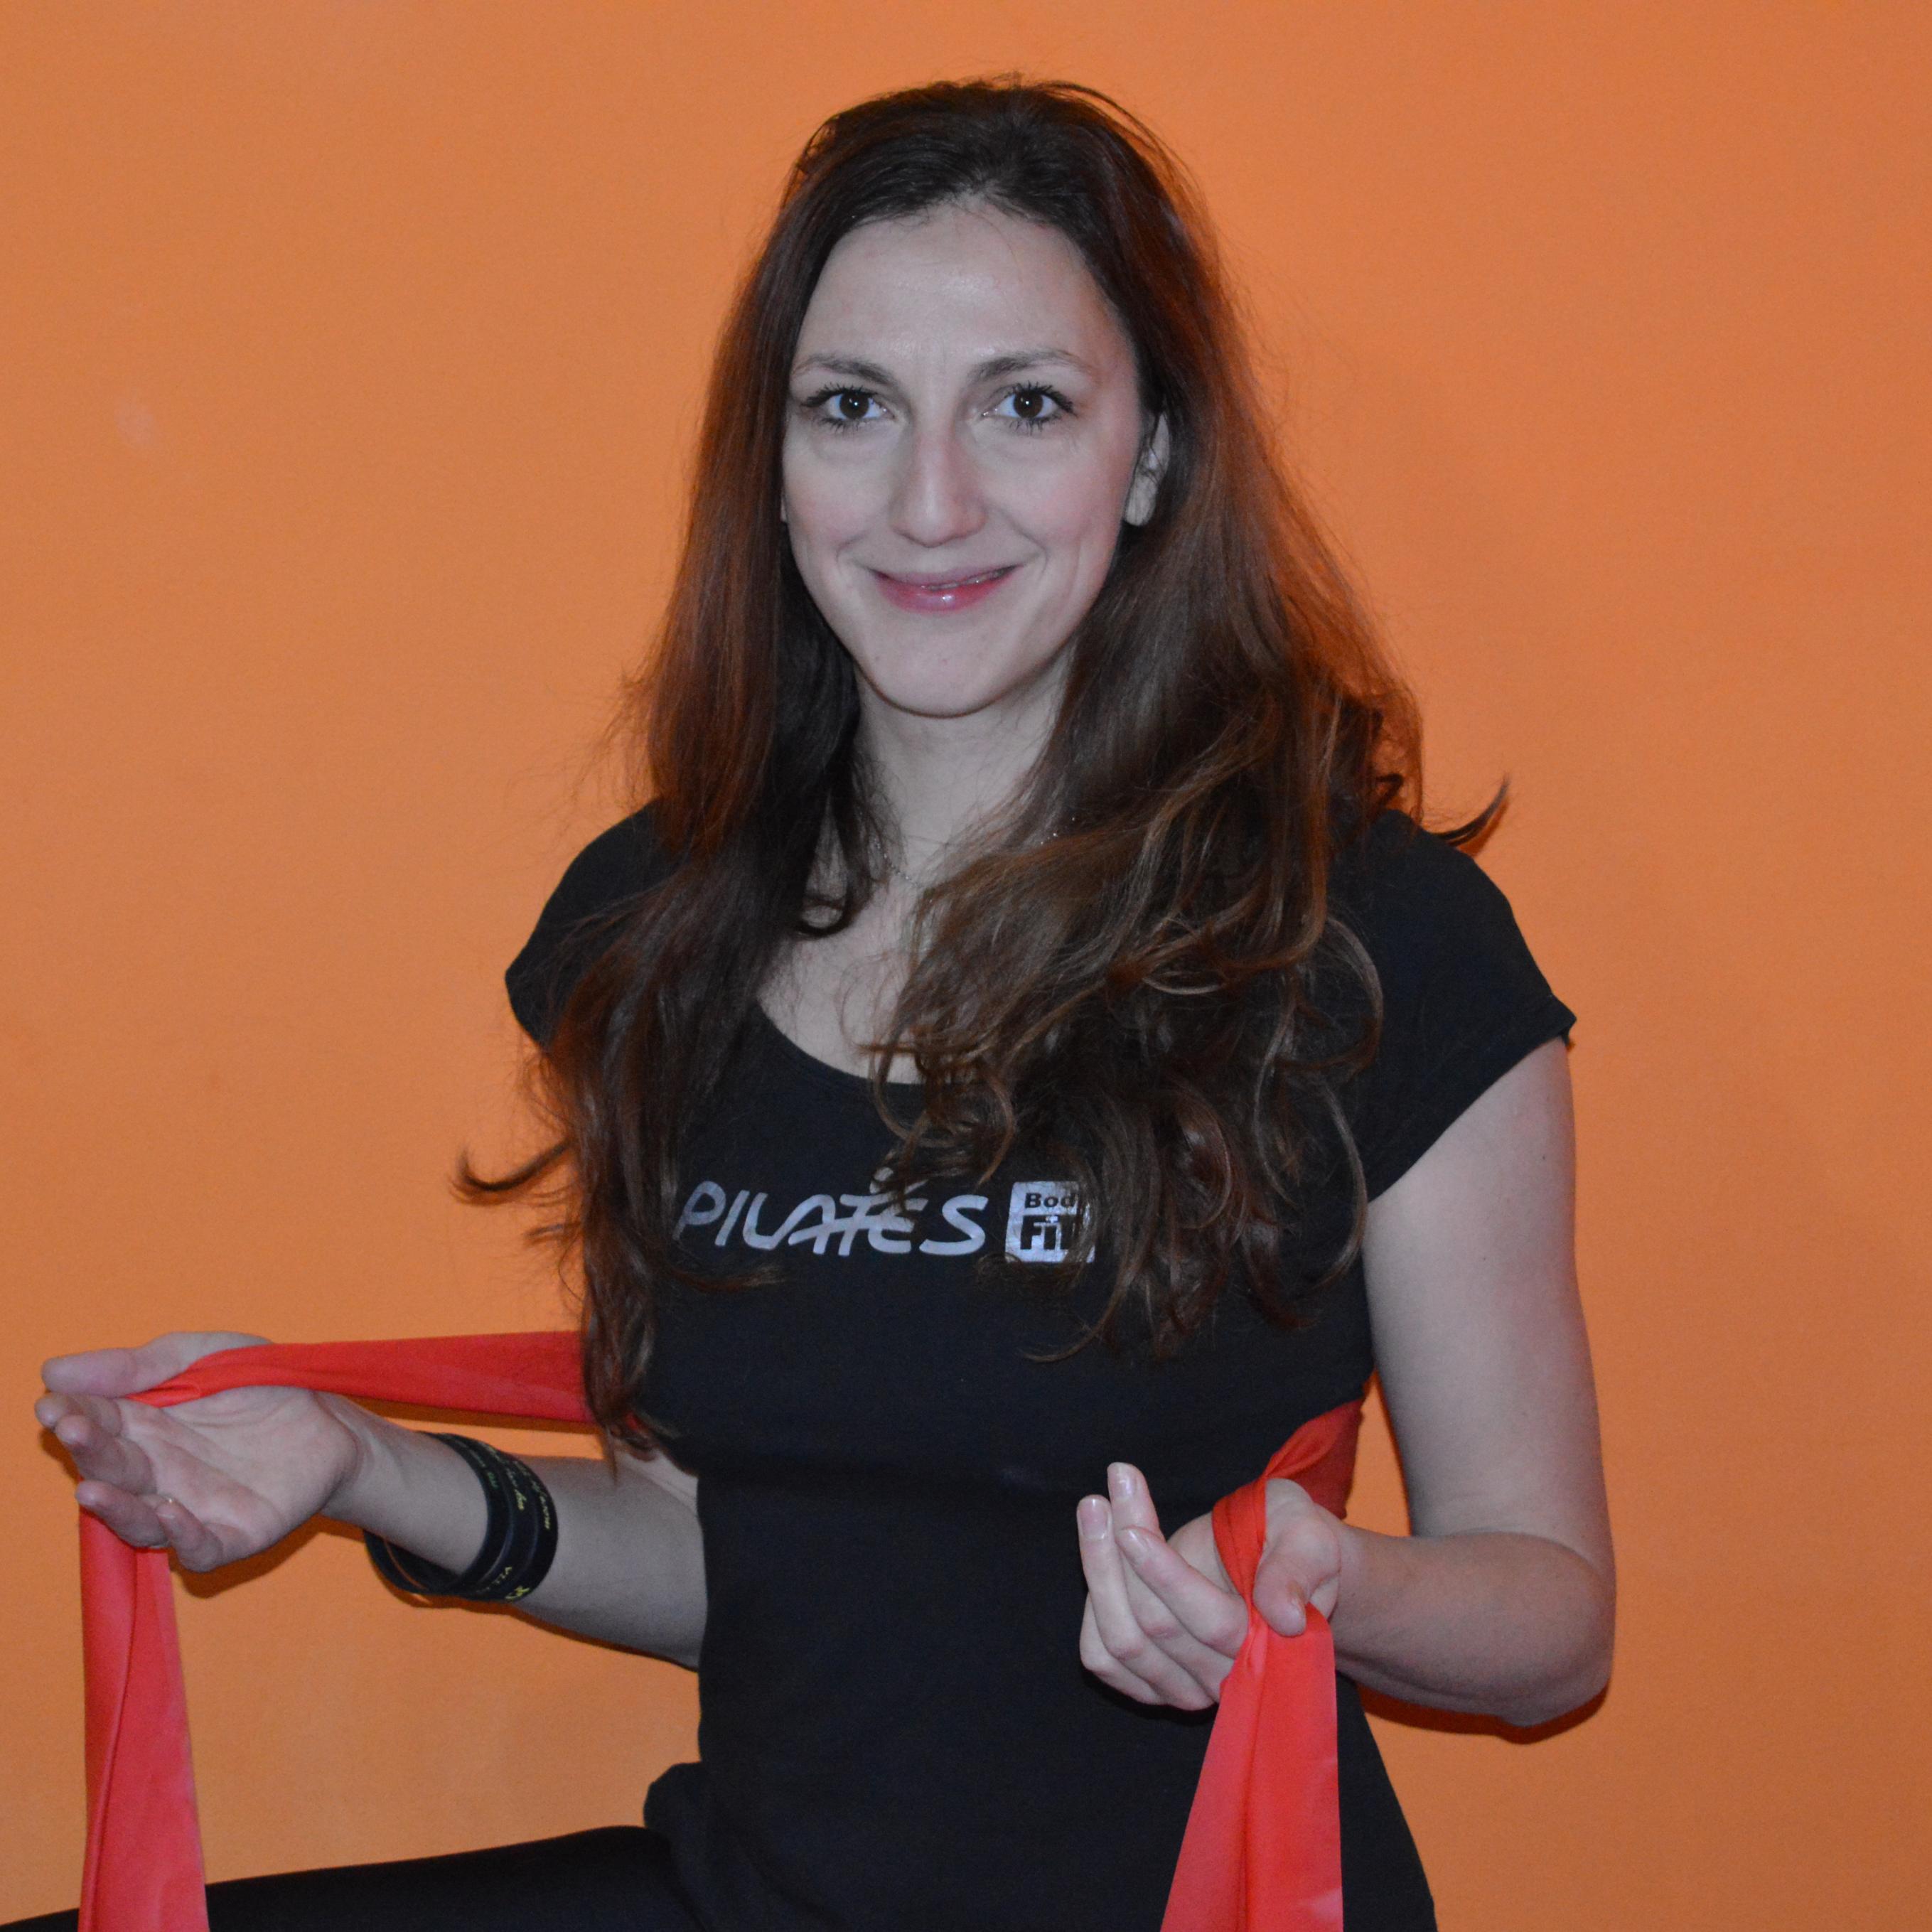 Tina Ferlinc